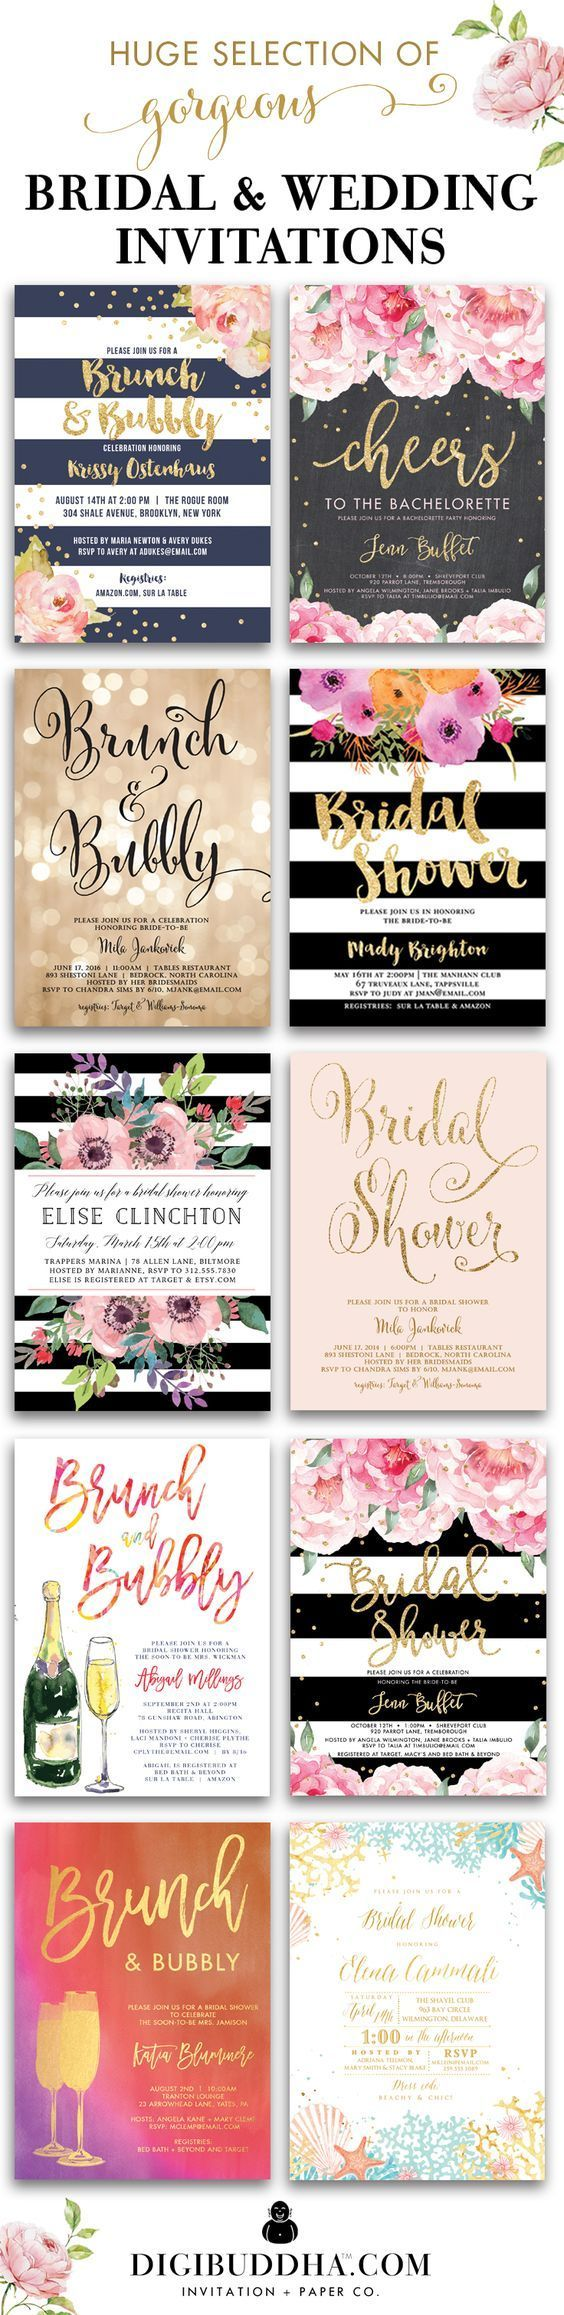 Trend setting bridal shower invitations and wedding invitations